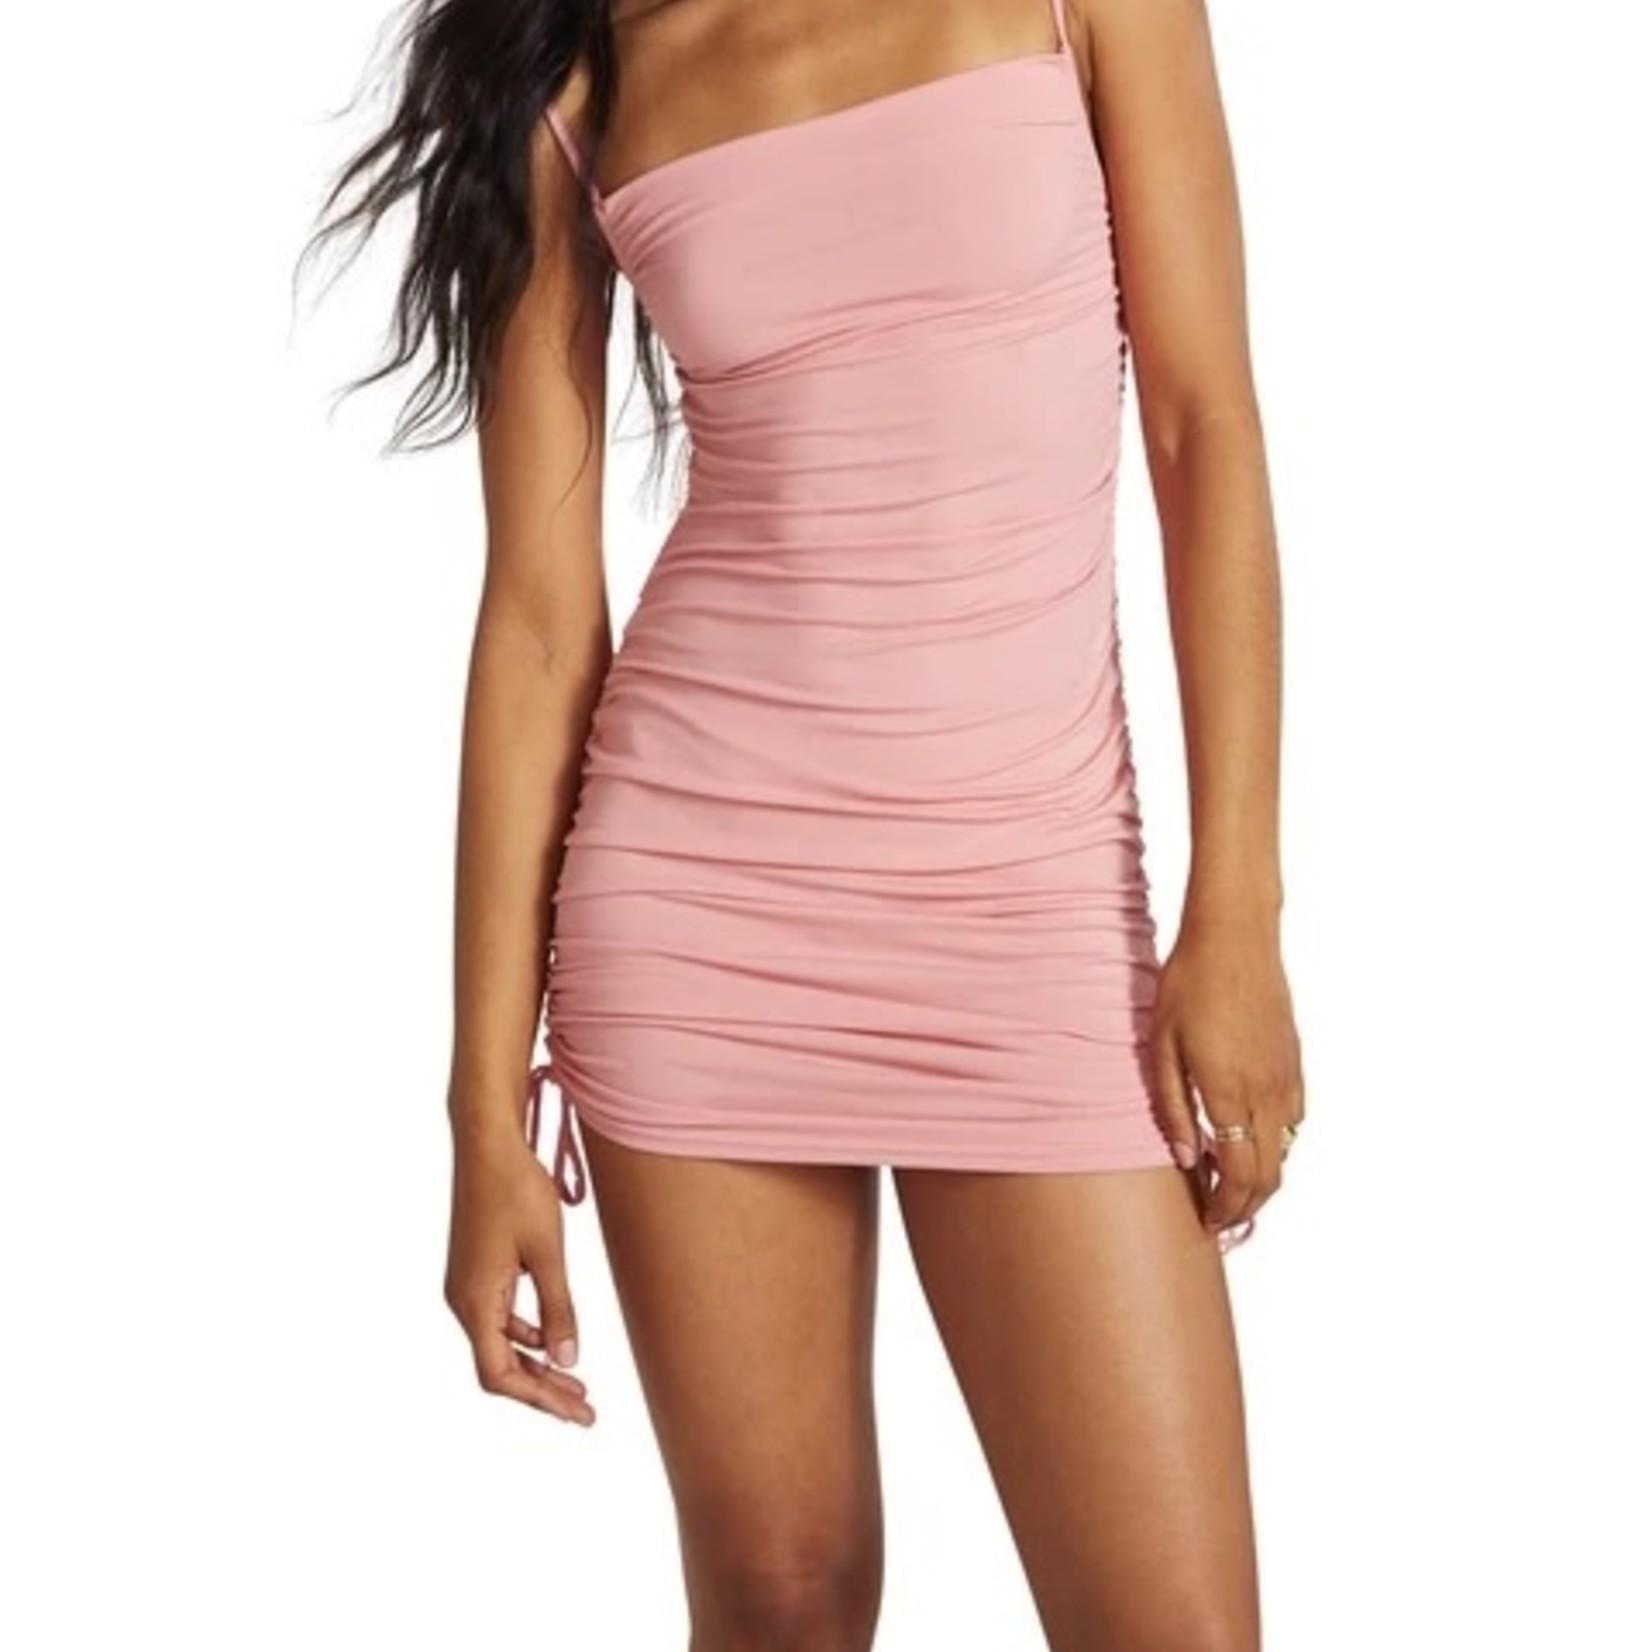 O'Neill BB Dakota Give 'Em A Cinch Dress